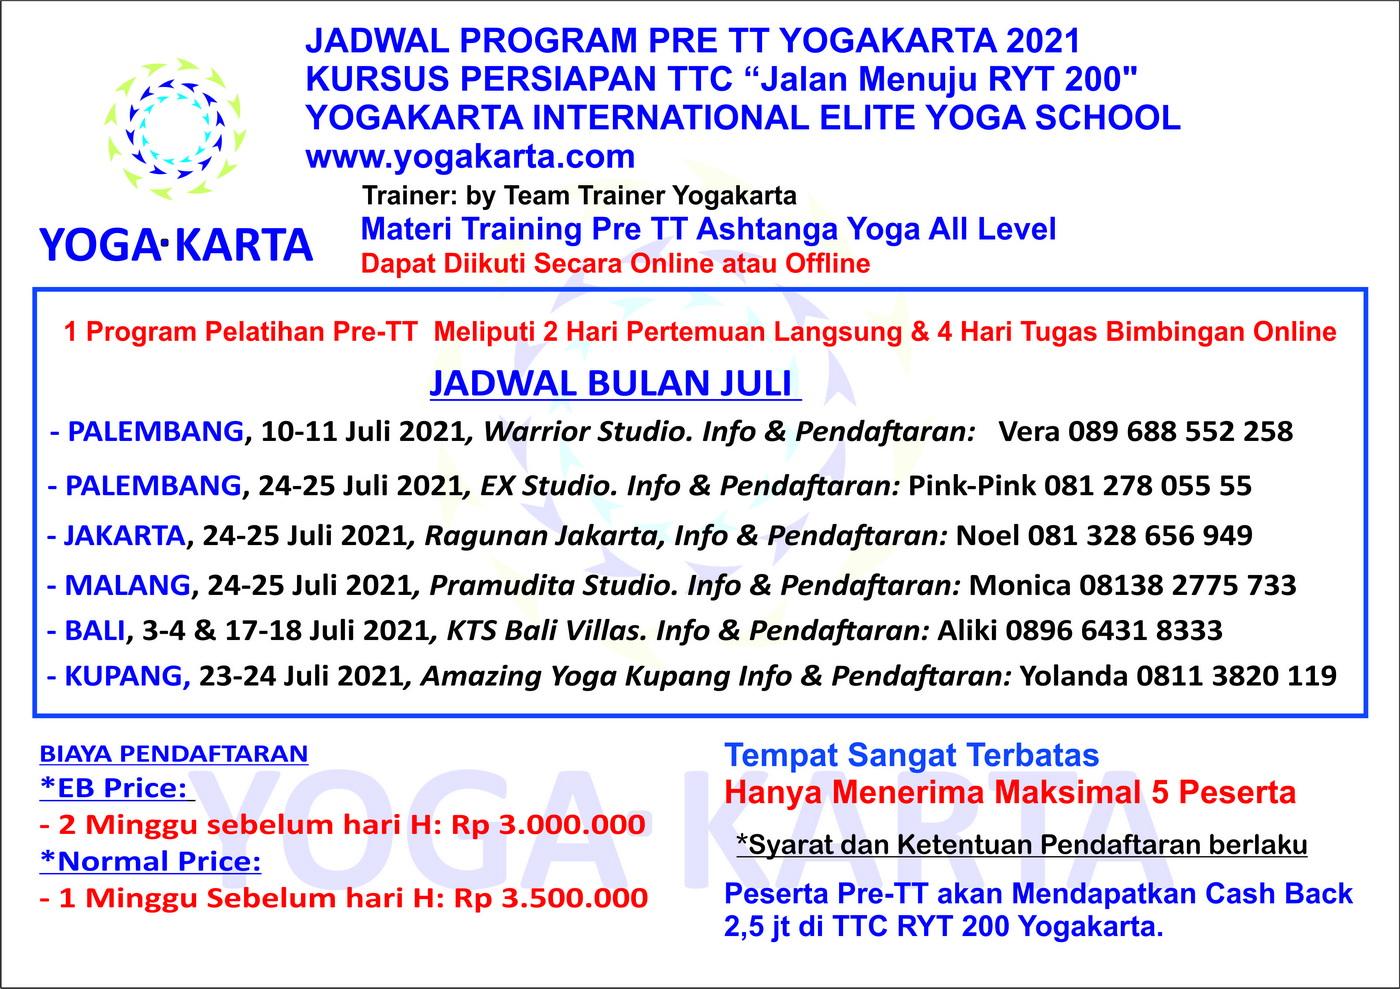 Jadwal Pelatihan Pre TT Yogakarta Juli